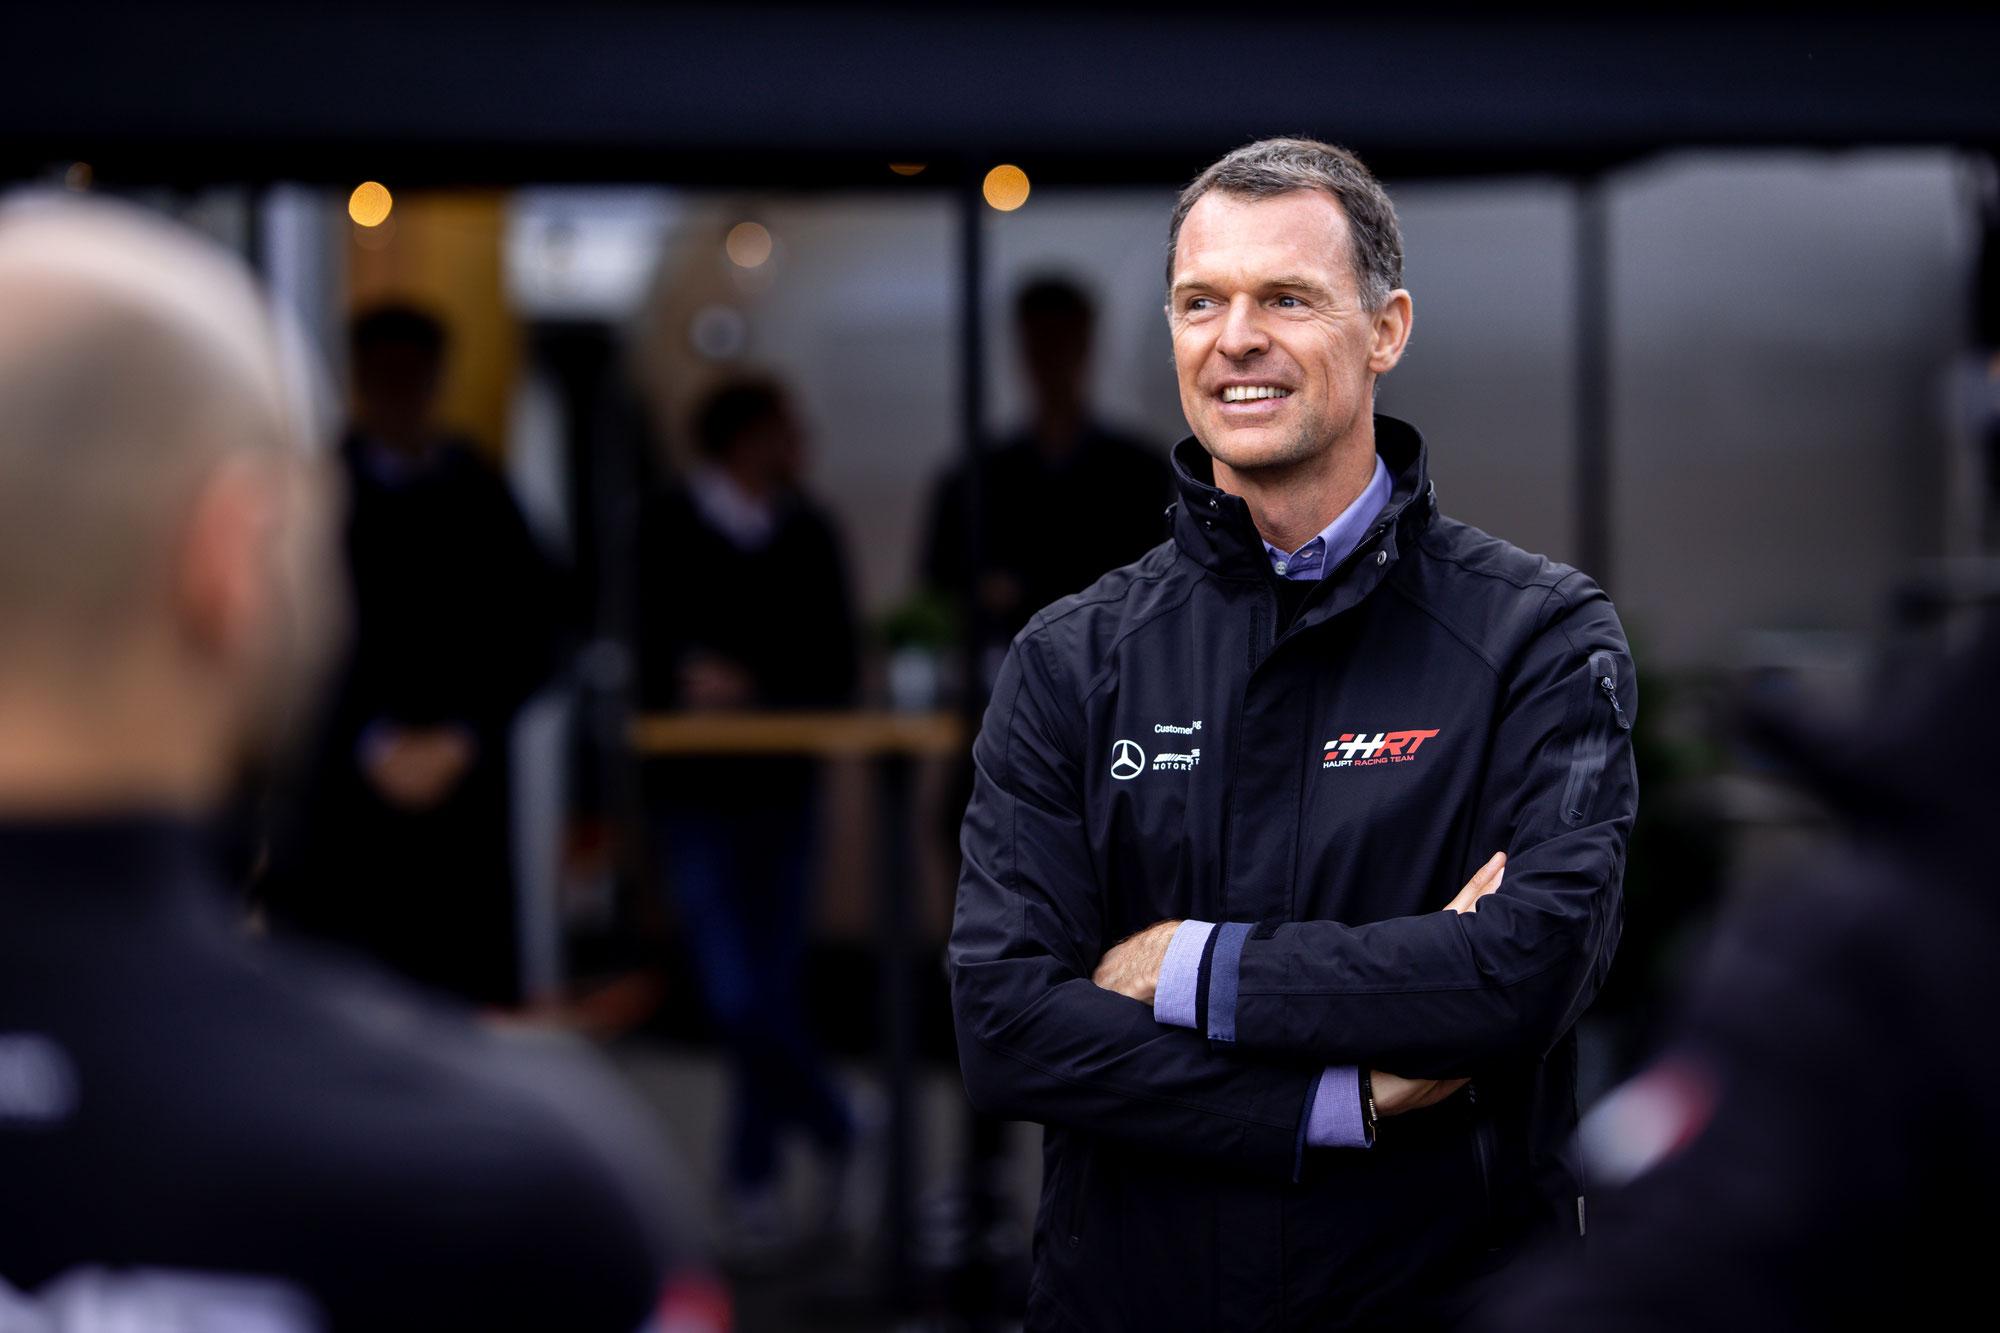 Alles auf Anfang in Hockenheim: zehn DTM-Teams beim ersten offiziellen Saisontest